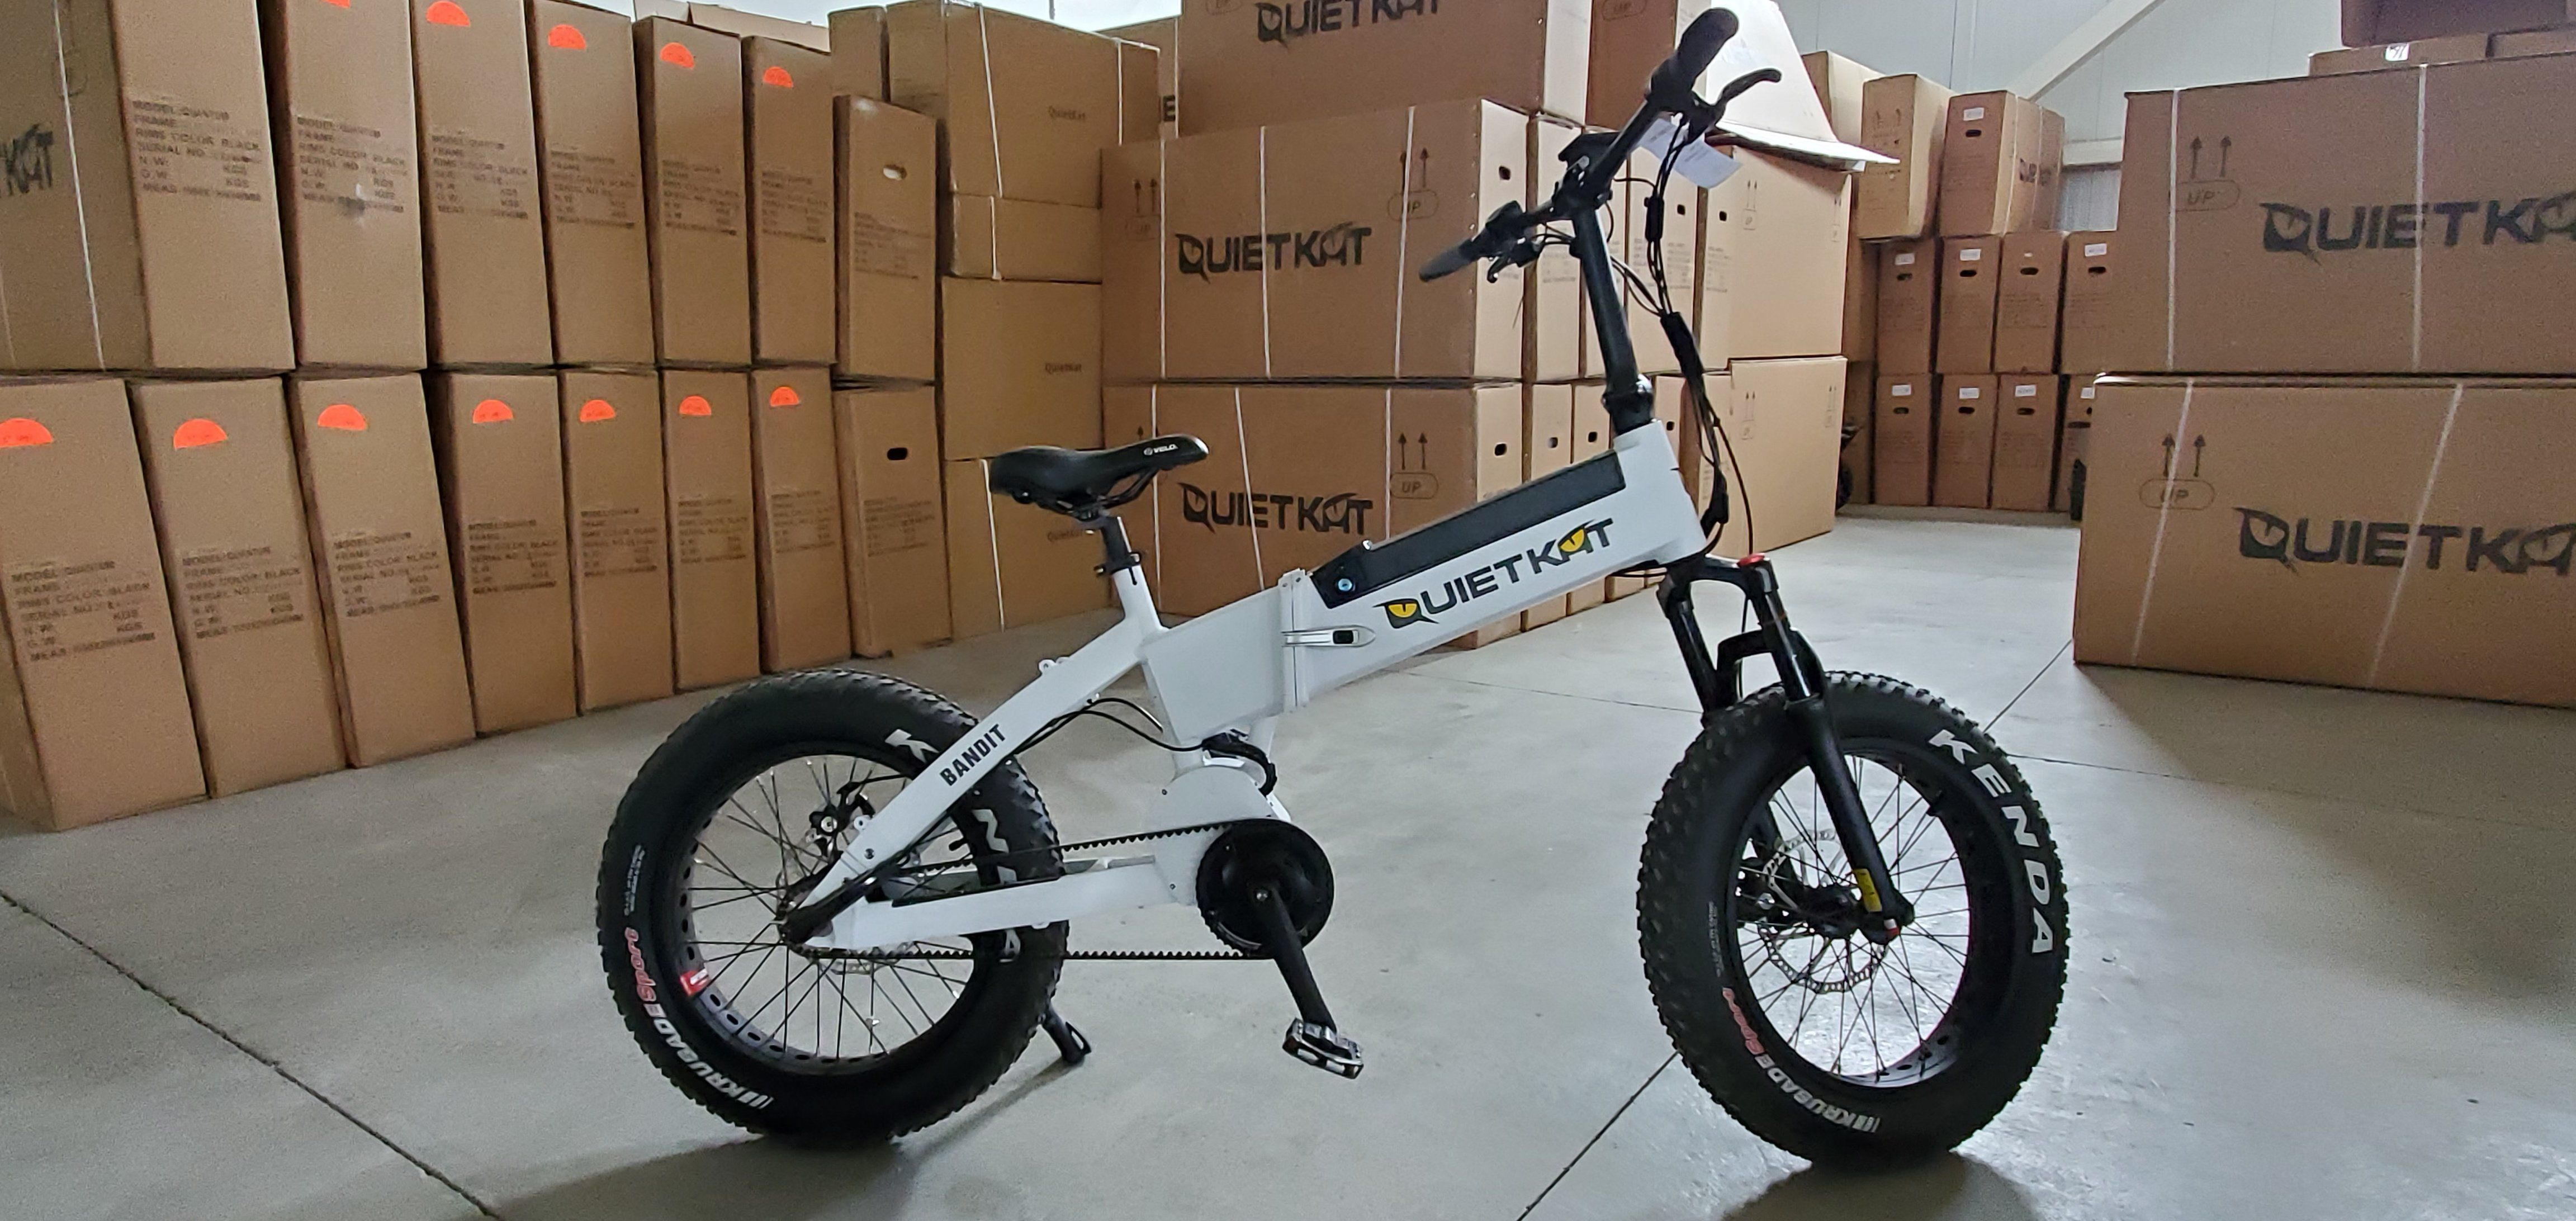 Quietkat 2018 Bandit Folding Electric Bike Demo 944 Folding Electric Bike Electric Bike Bike